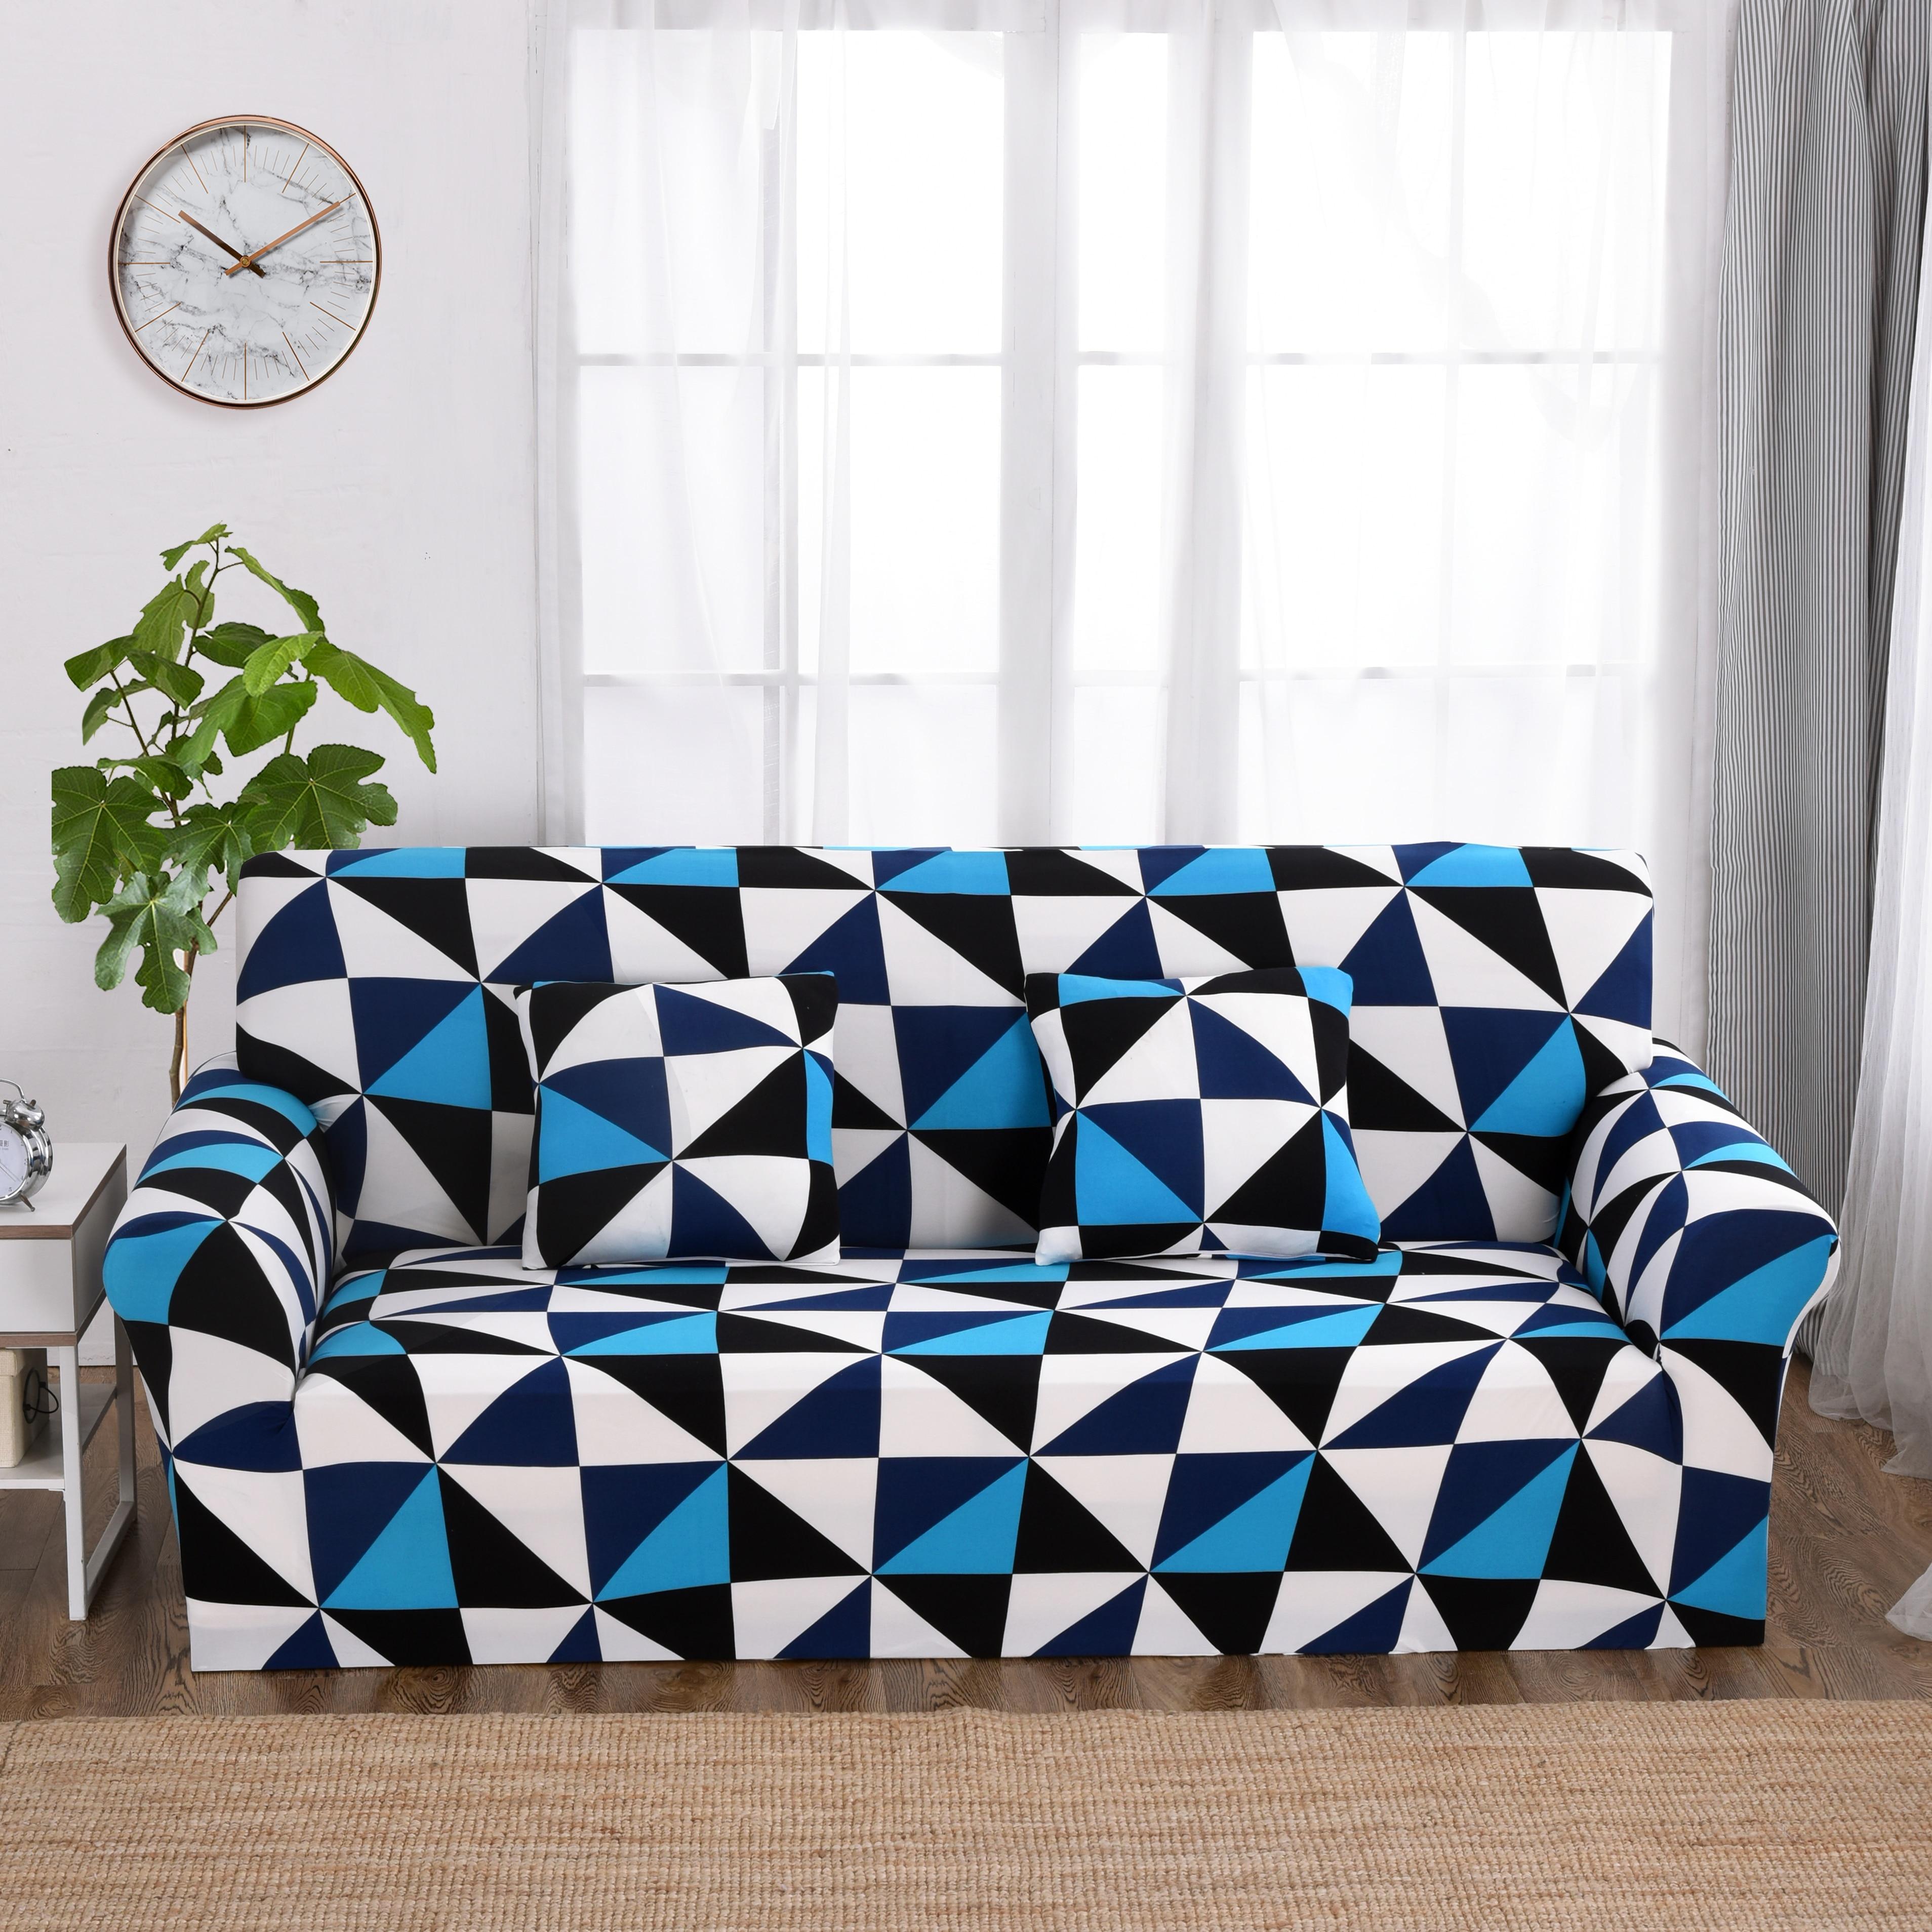 Popular Sofa Big Seat Buy Cheap Sofa Big Seat lots from China Sofa